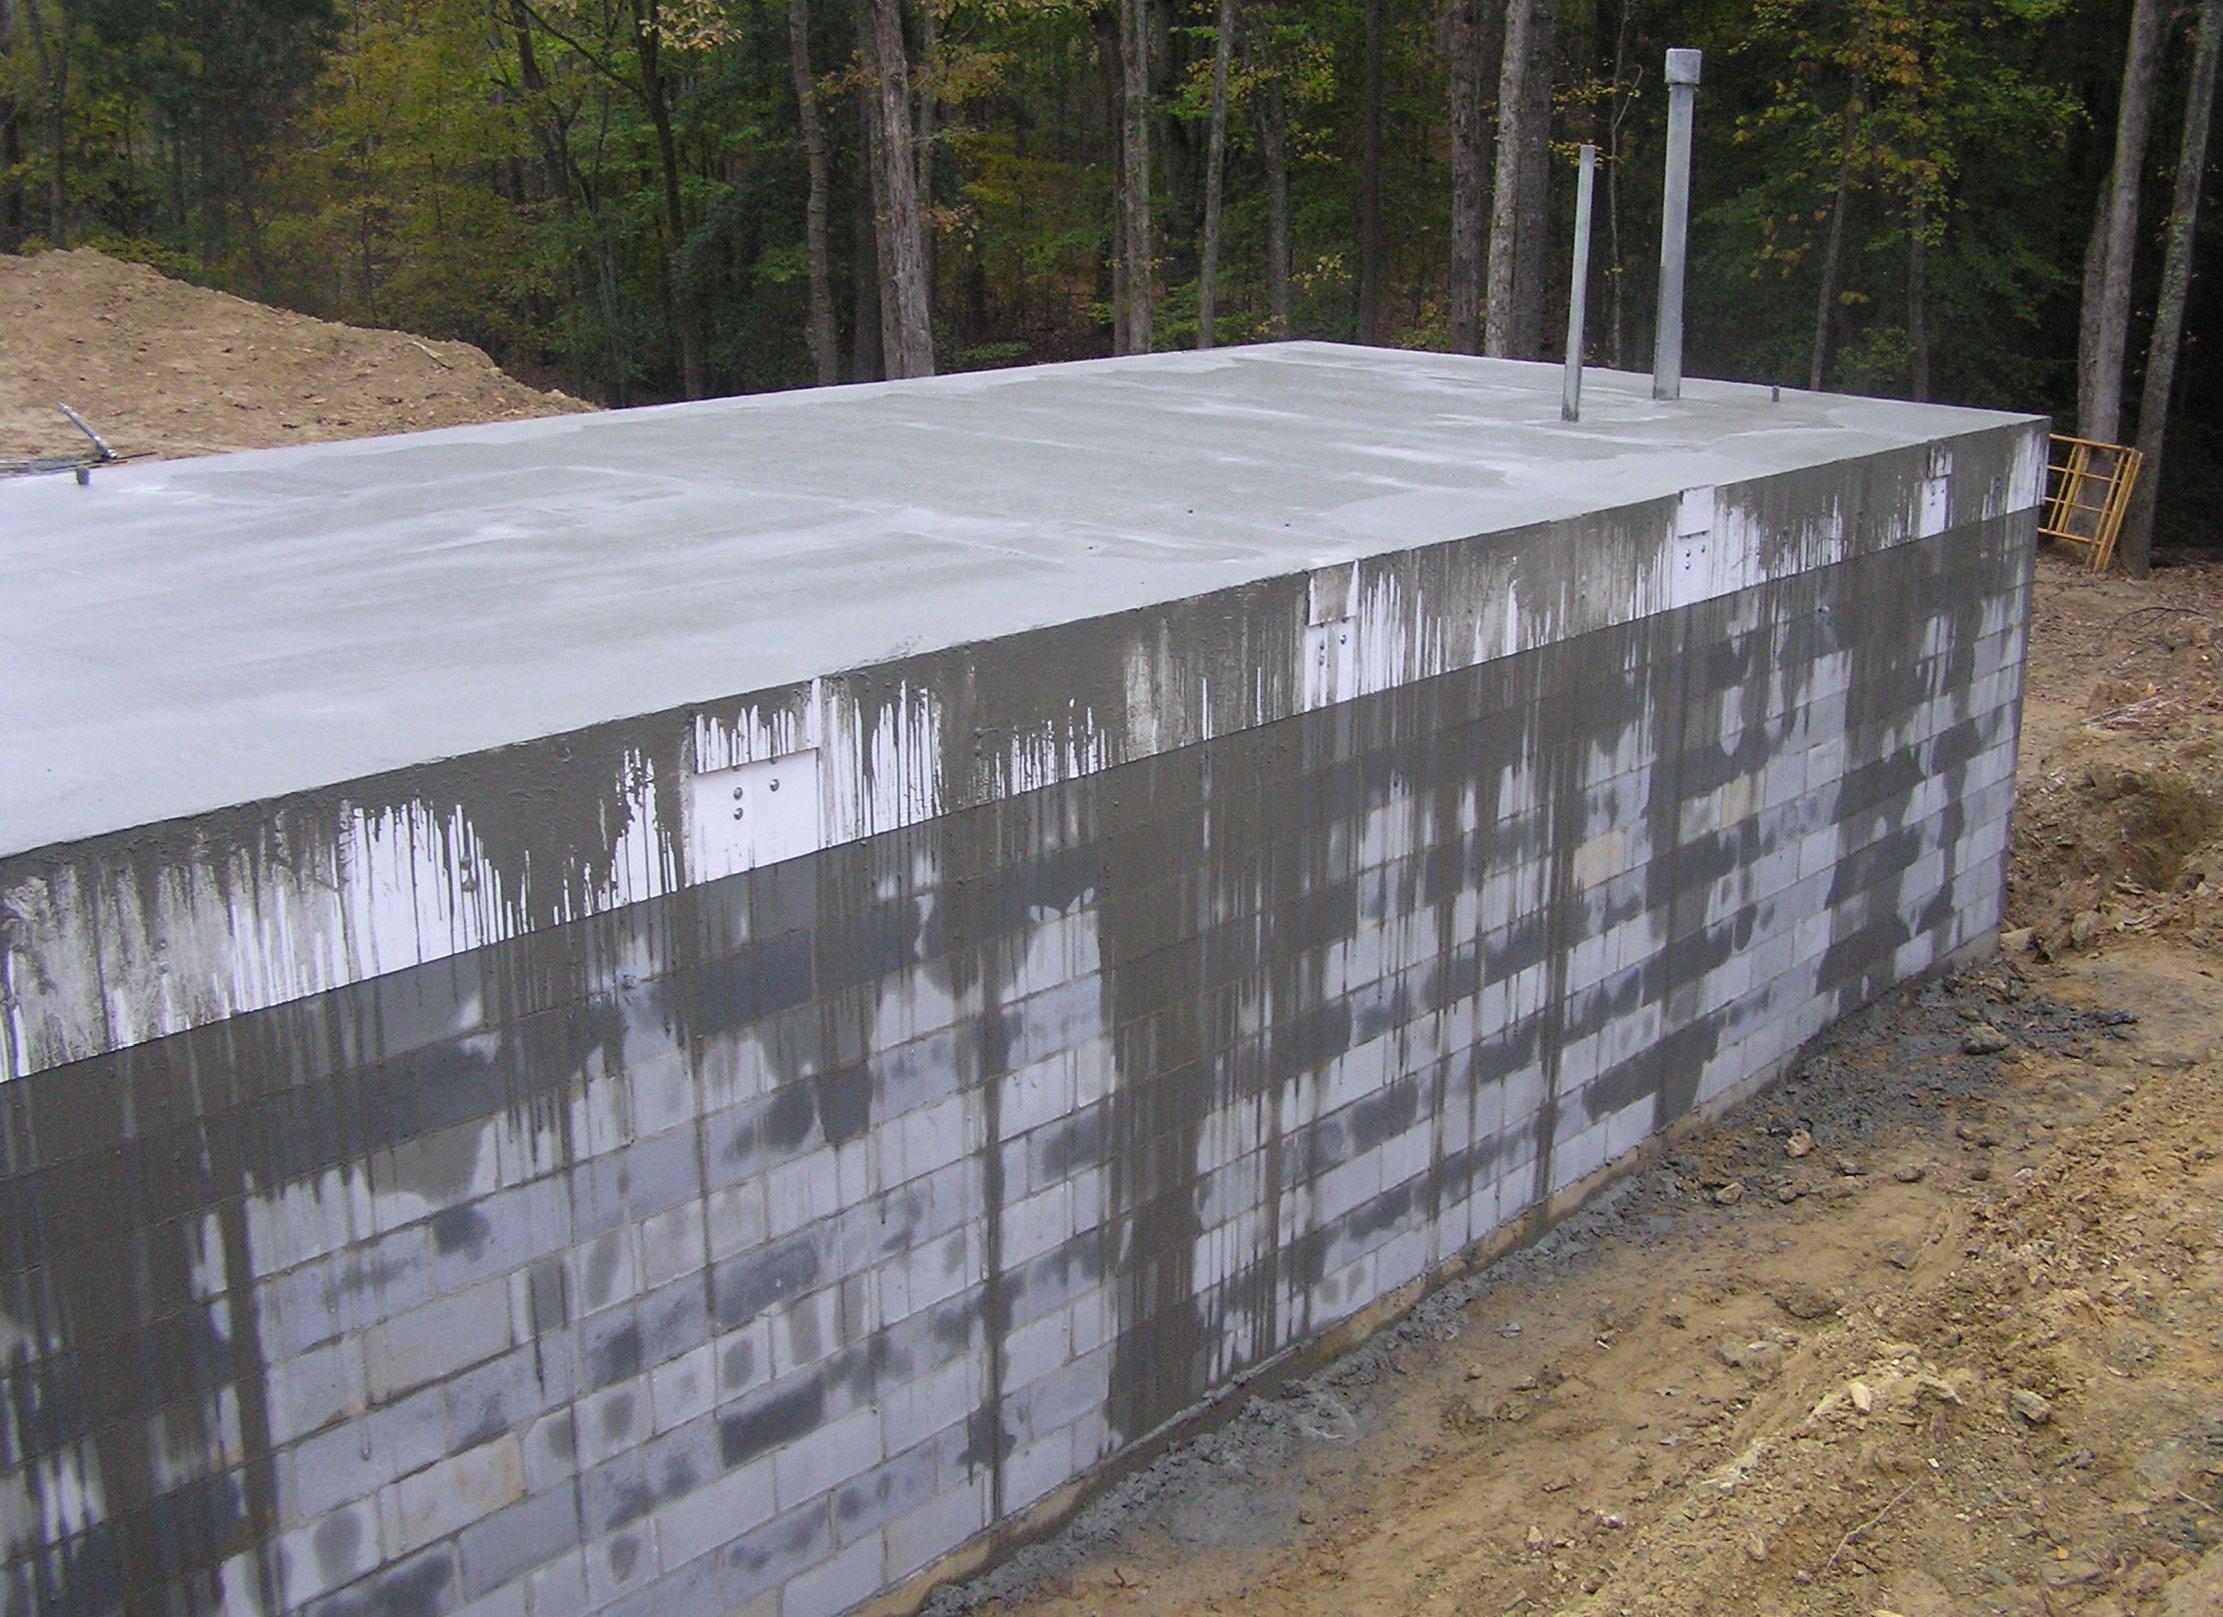 Steel reinforced concrete bomb shelter